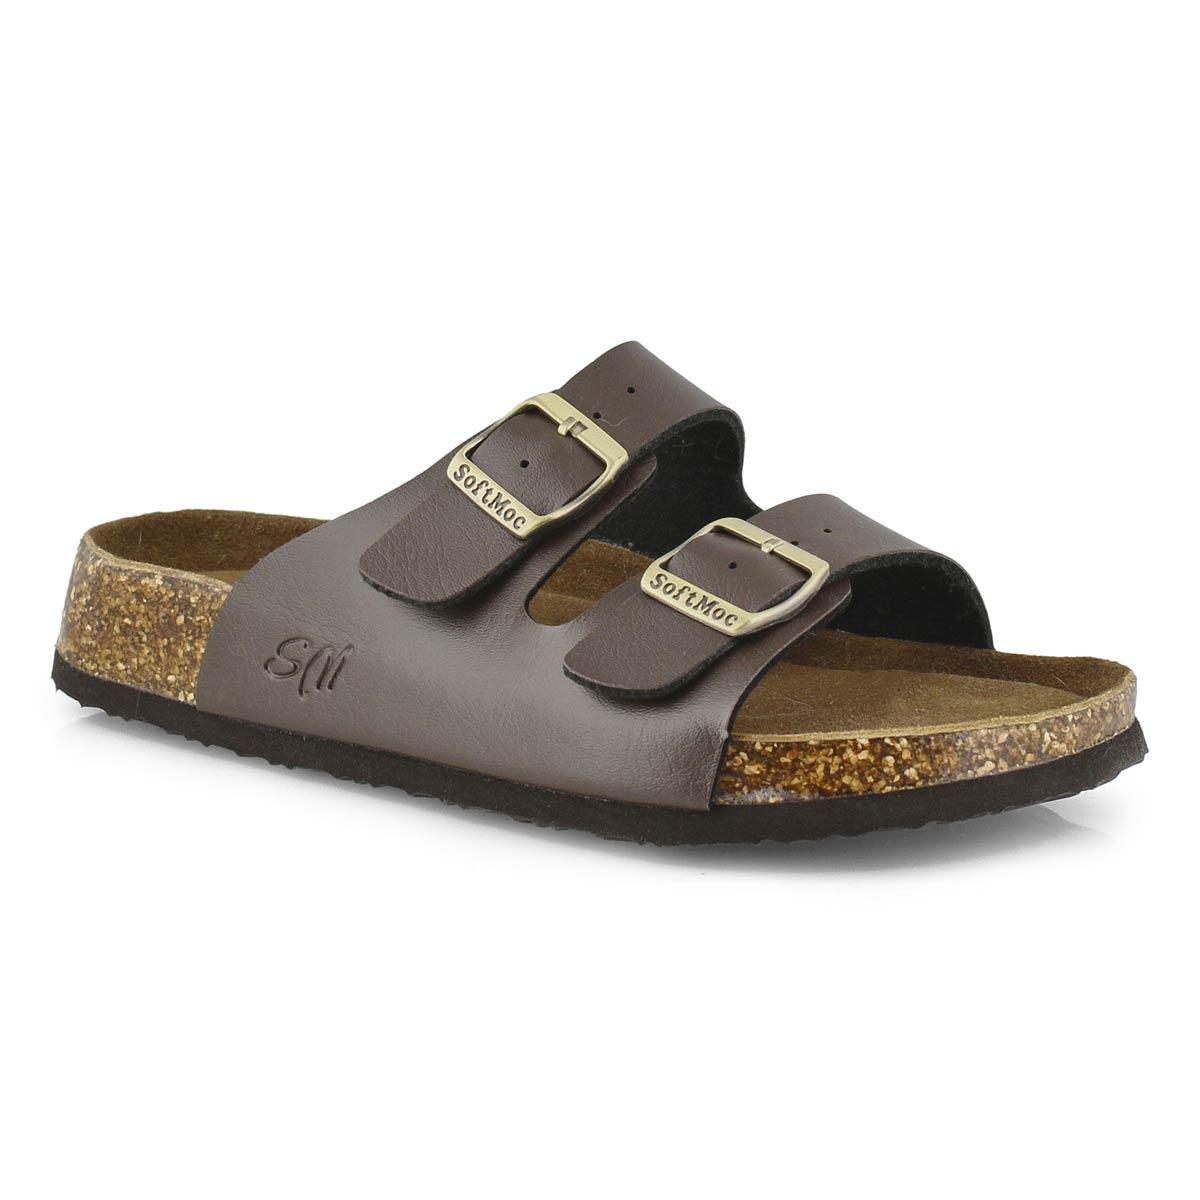 Lds Anna 5 PU brn memory foam sld sandal